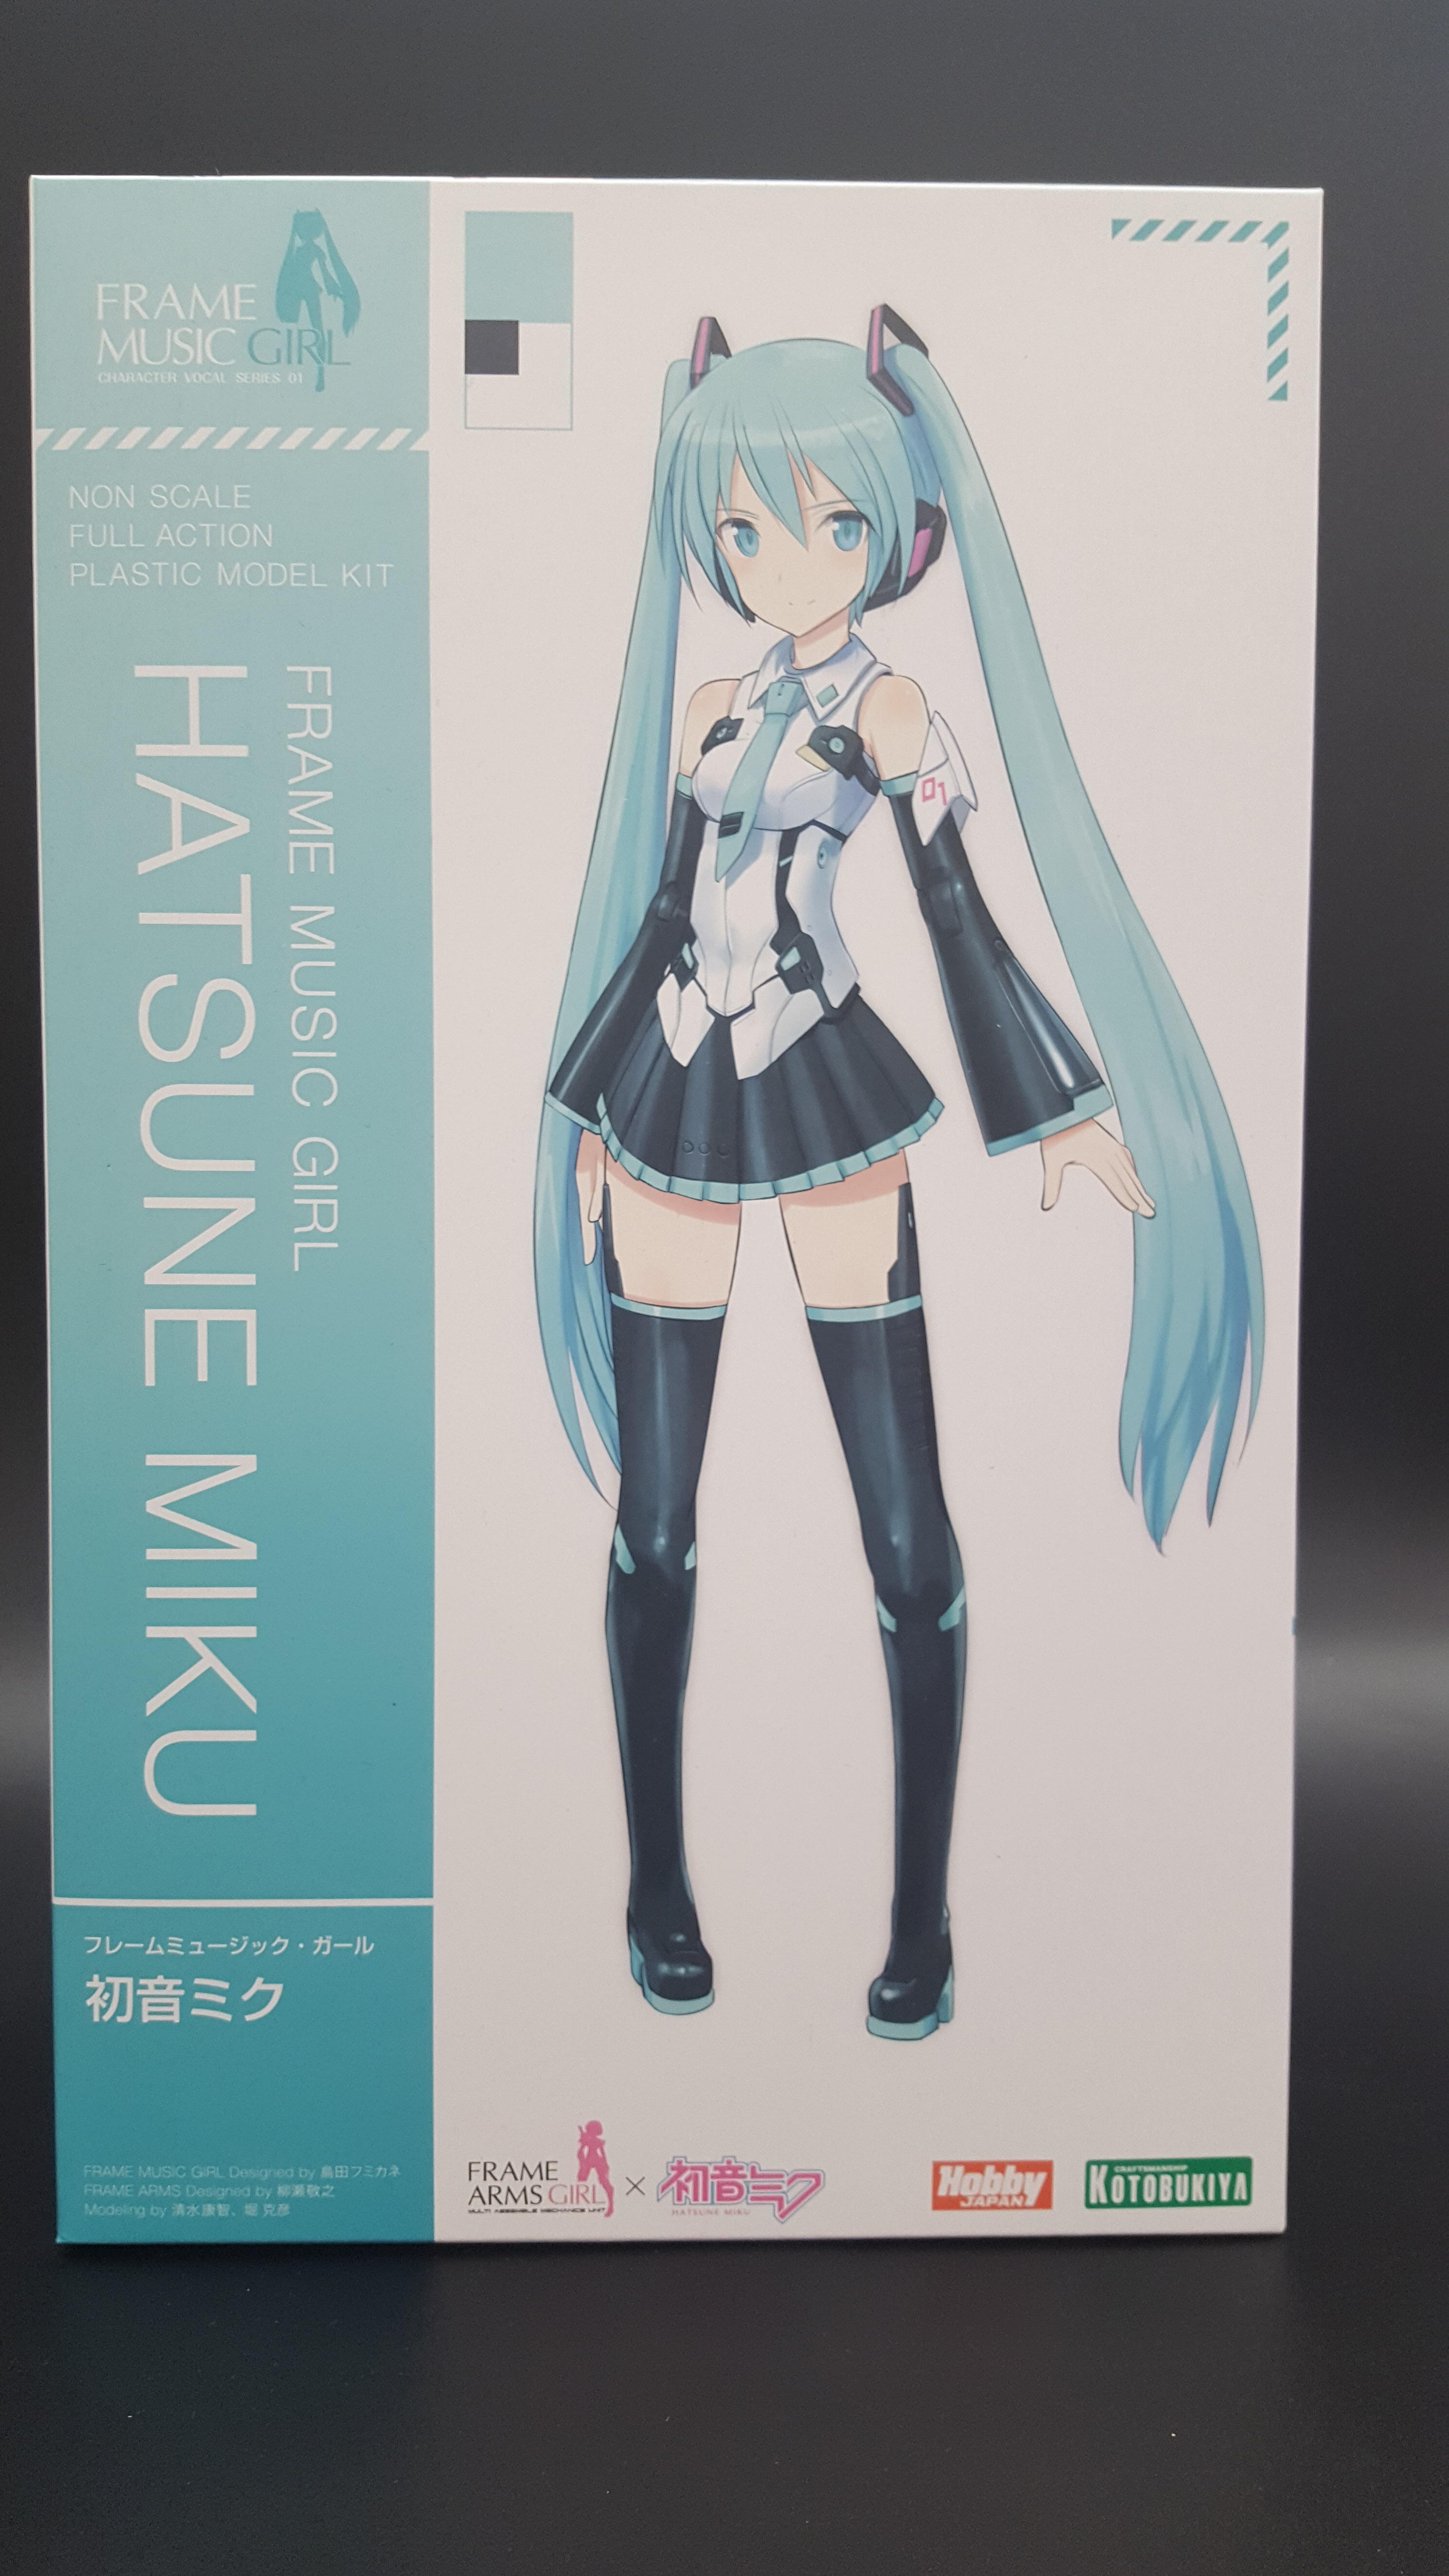 Frame Music Girl Hatsune Miku (Secondary Production)